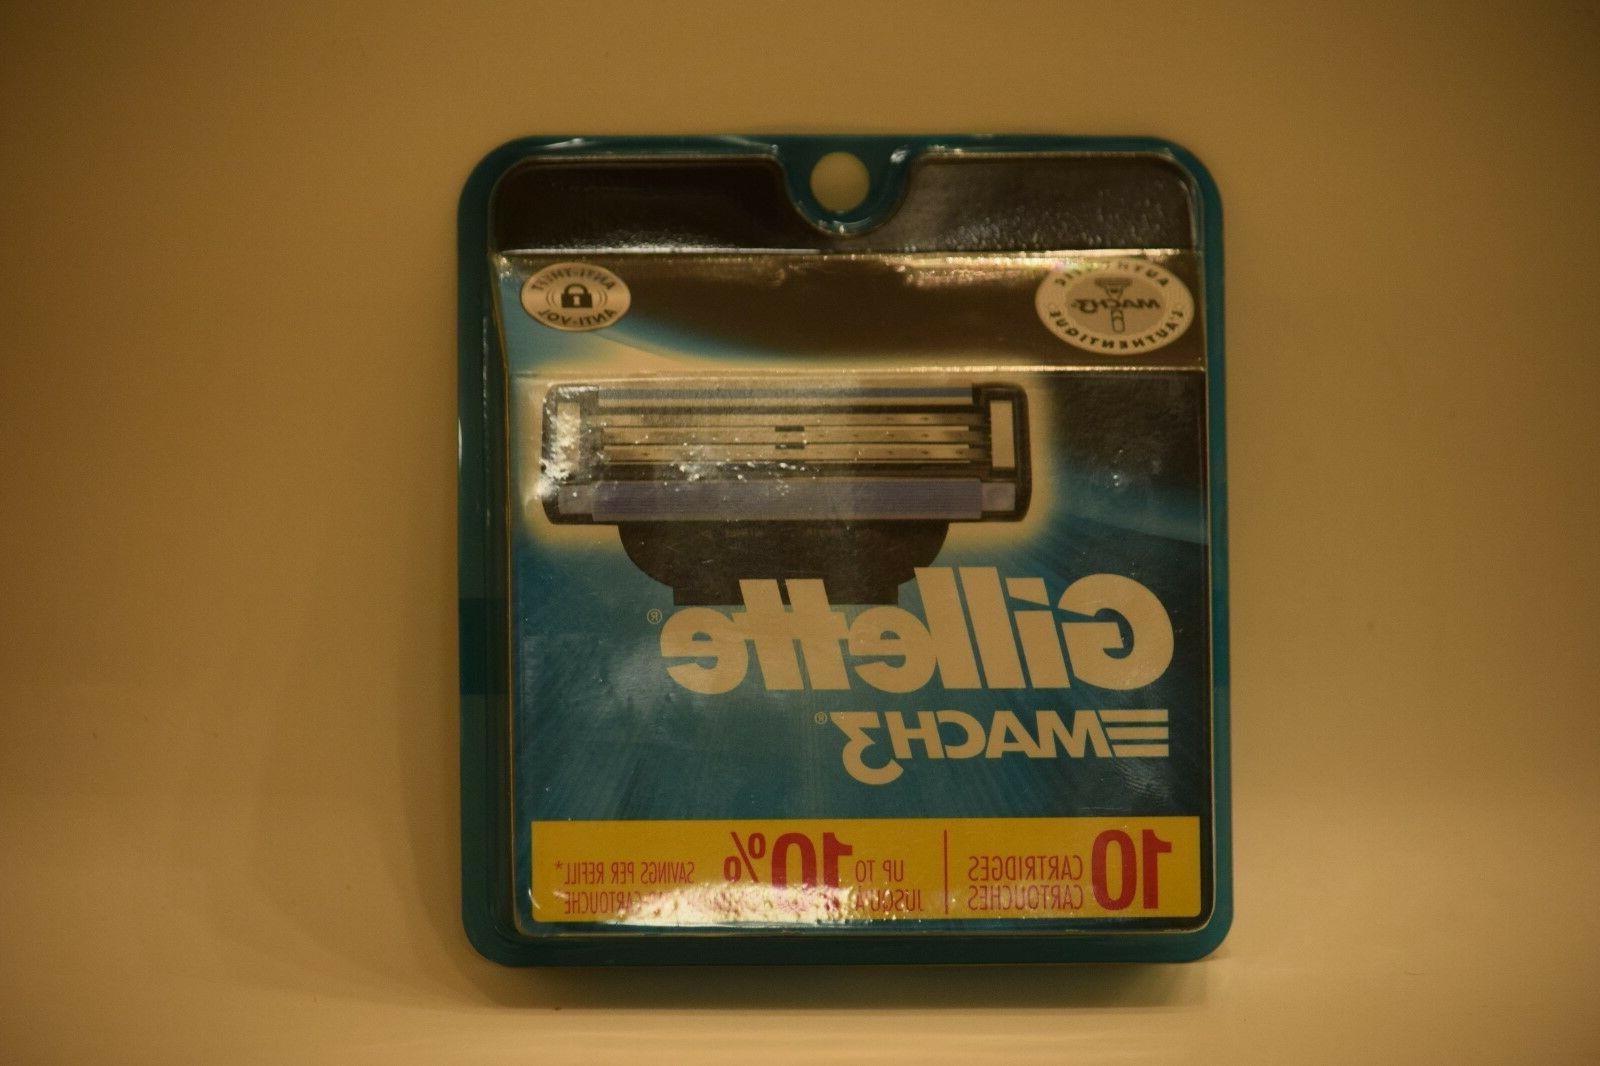 mach3 refill cartridges 10 count razor blade